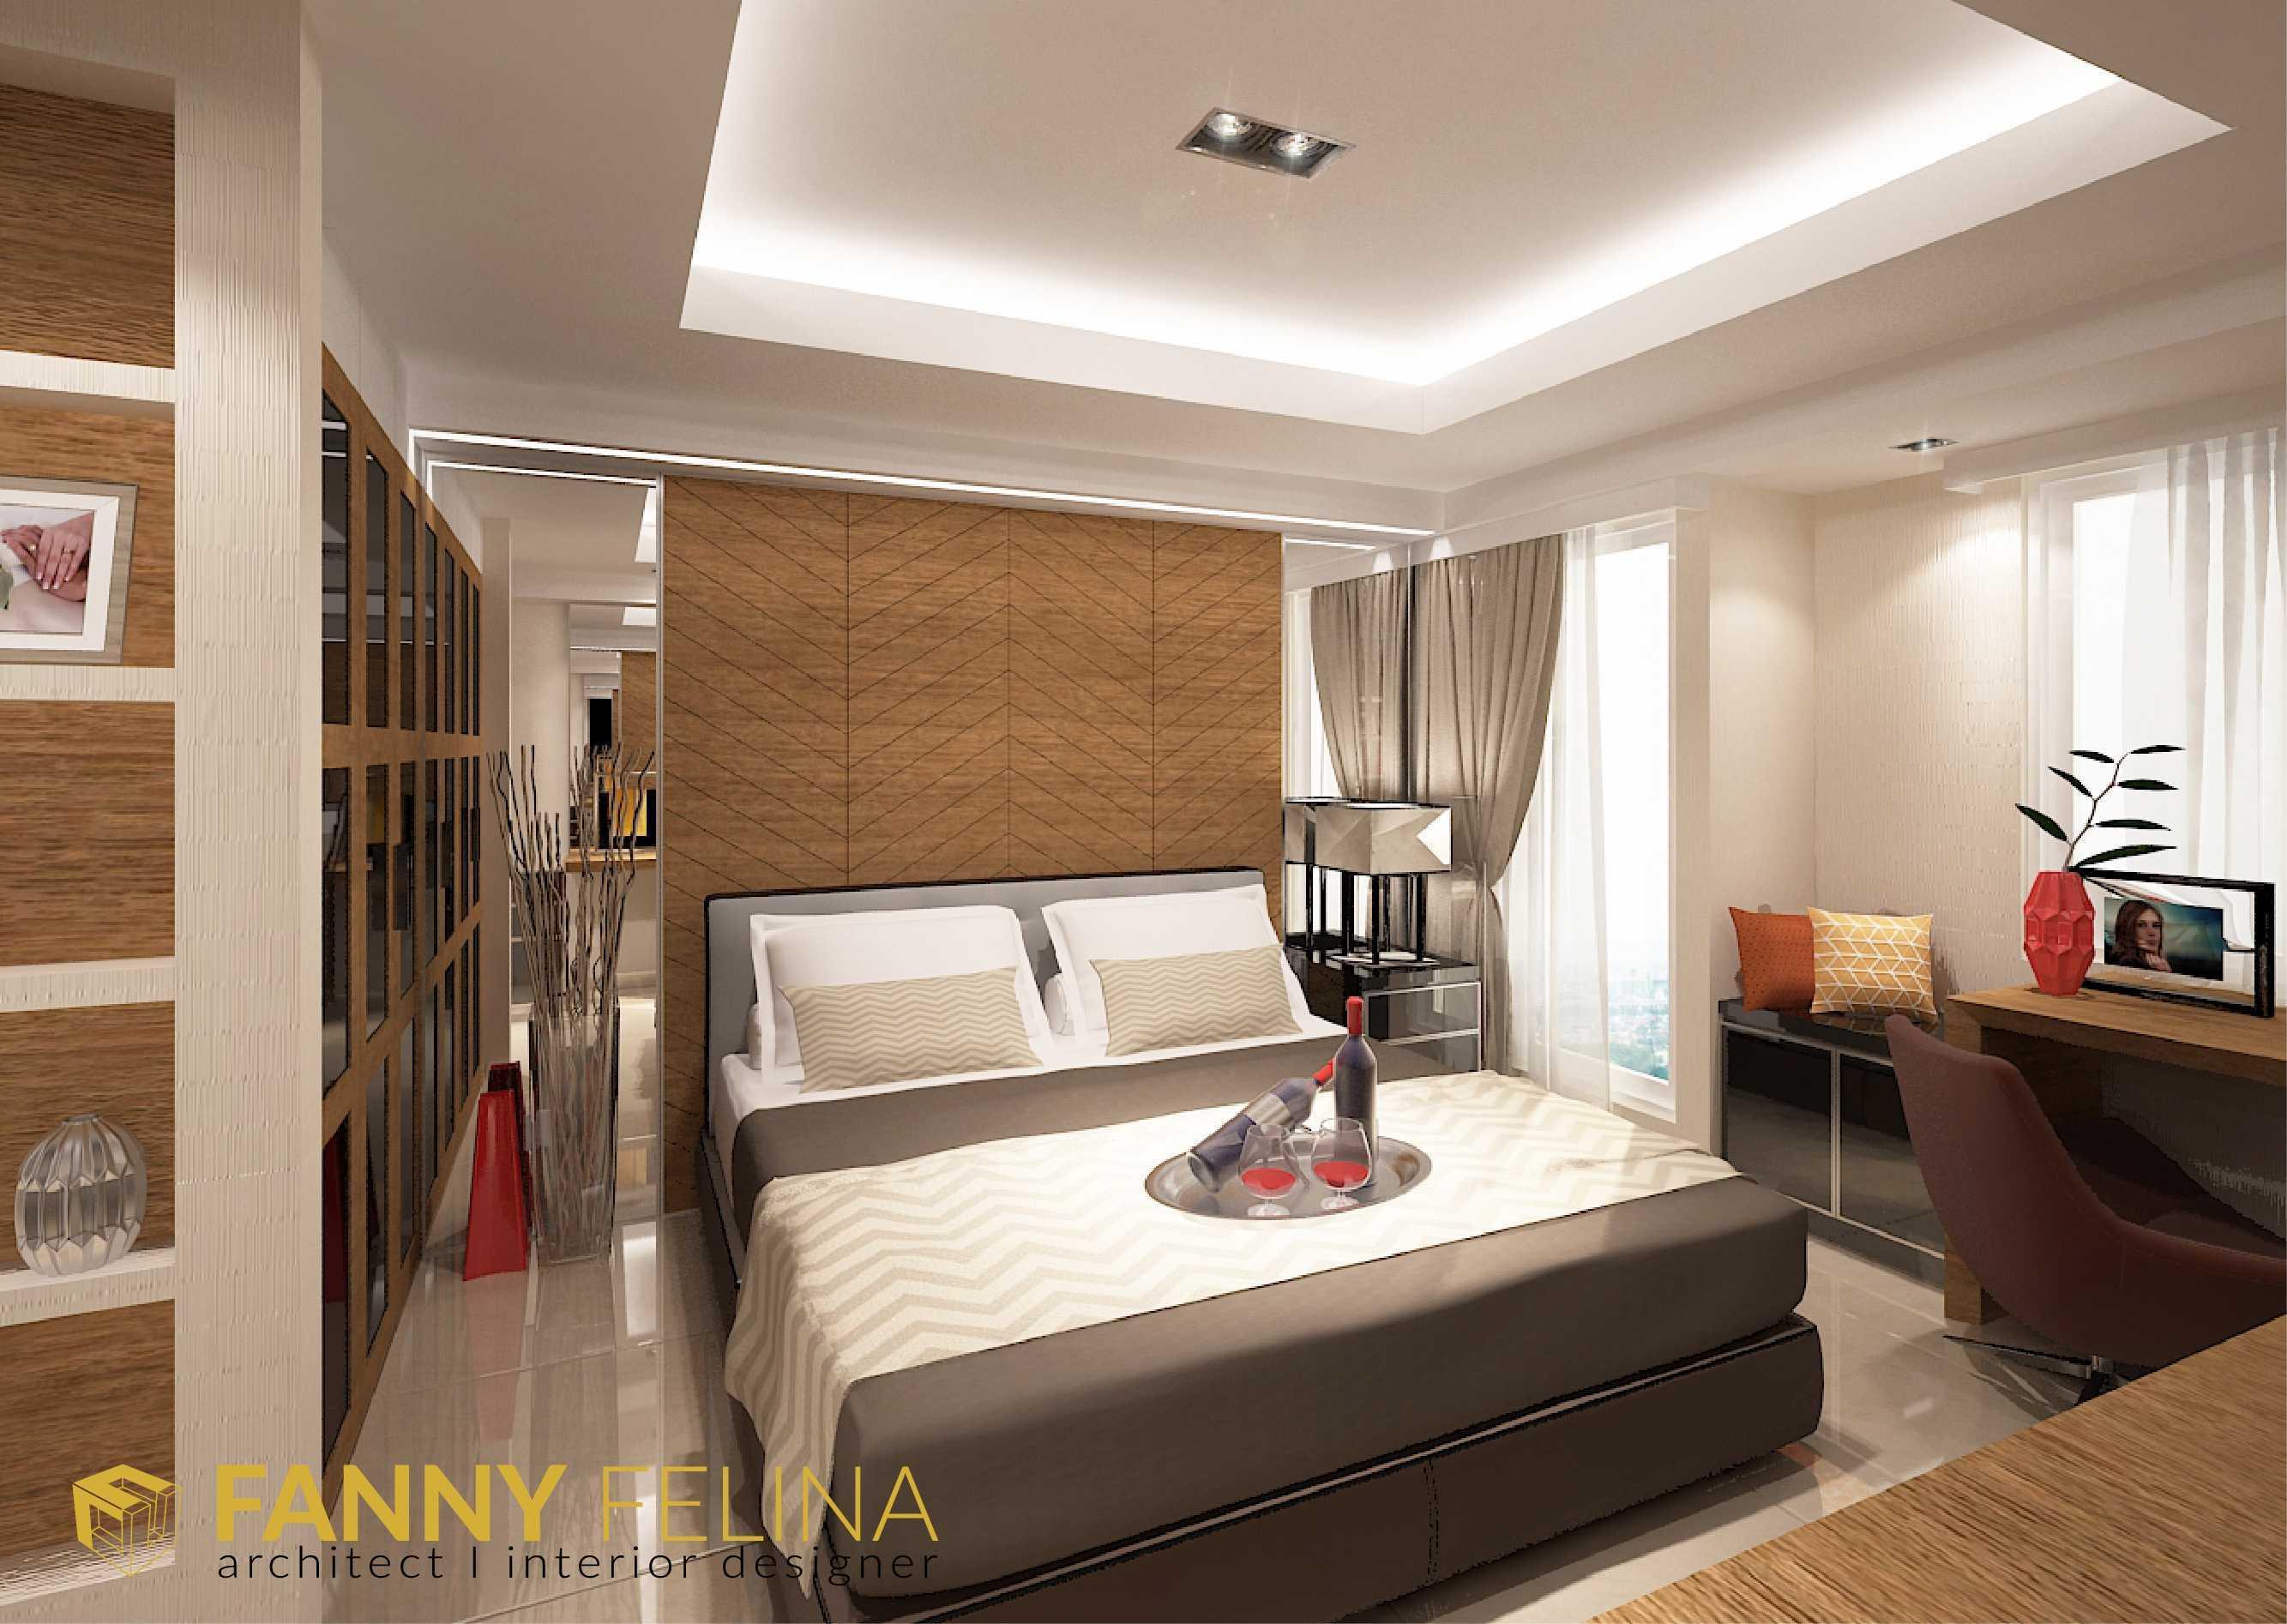 Fanny Felina Architecture & Interior Design Tanglin Studio Apartment Surabaya, Surabaya City, East Java, Indonesia Surabaya, Surabaya City, East Java, Indonesia Bedroom Kontemporer  36934